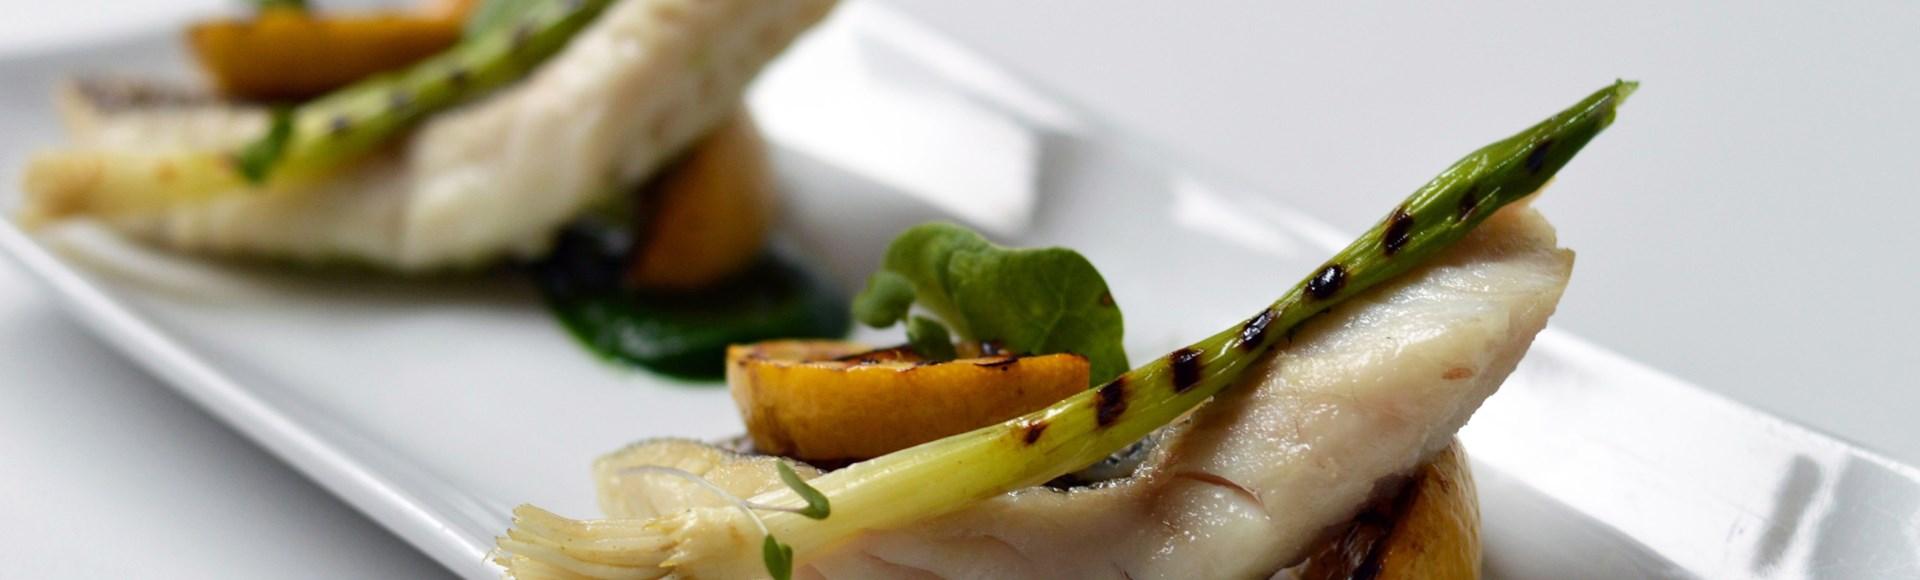 sea-food-menu-alargo-private-chef-manos-agios-nikolaos - Private Chef Service For Villas in Lasithi, Crete